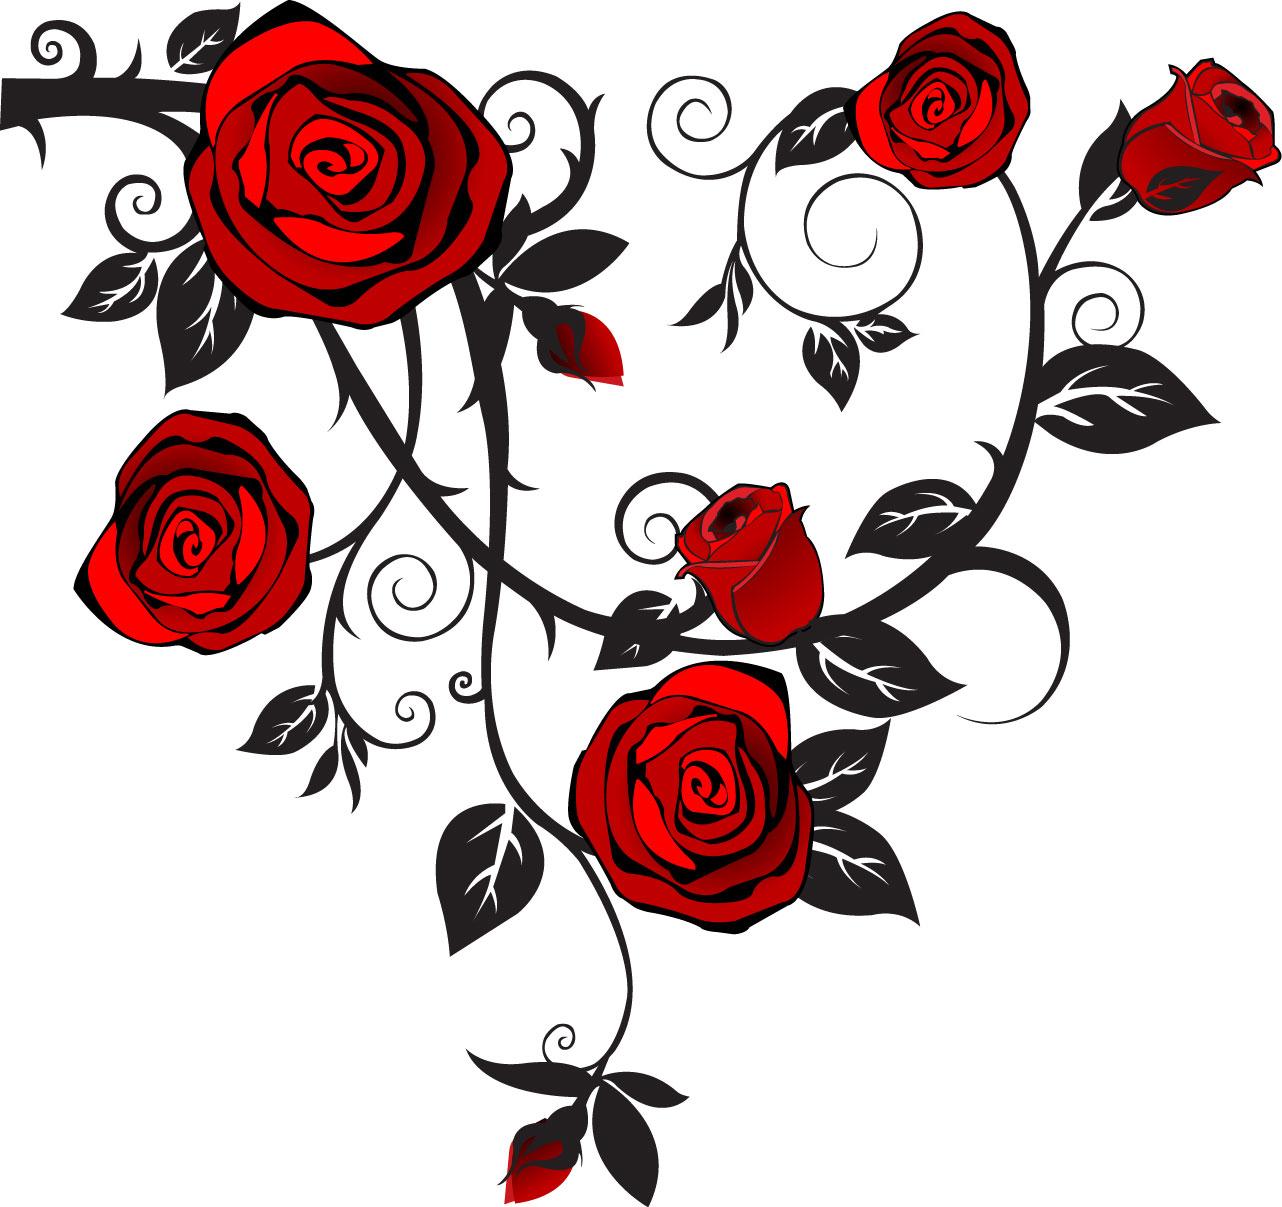 1282x1207 Roses Cartoon Group